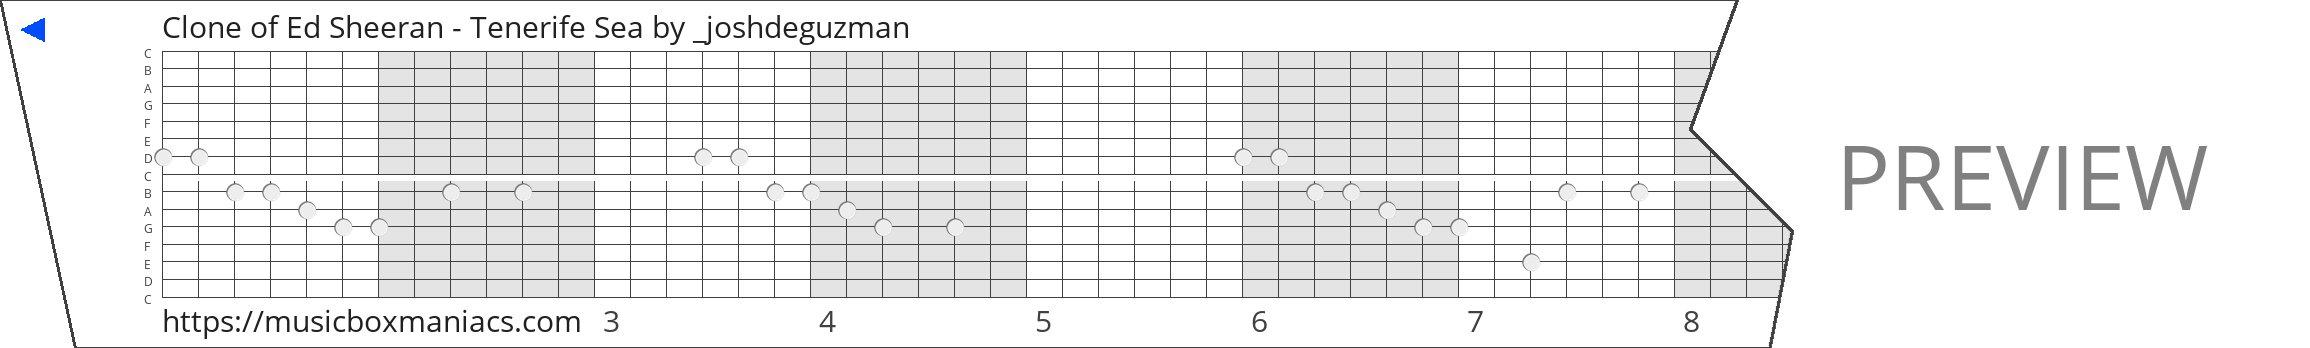 Clone of Ed Sheeran - Tenerife Sea 15 note music box paper strip